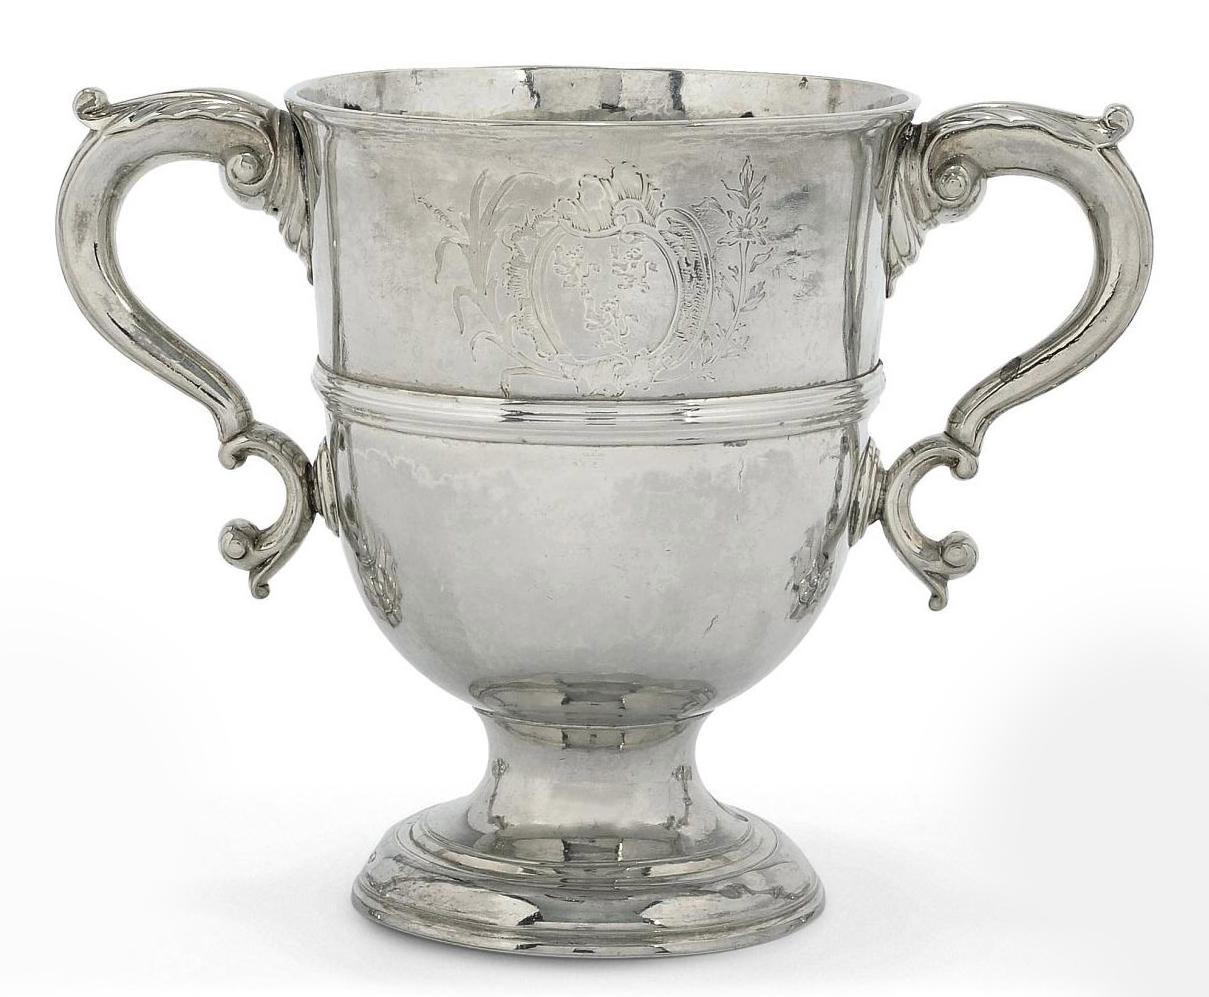 A GEORGE II IRISH SILVER TWO-HANDLED CUP